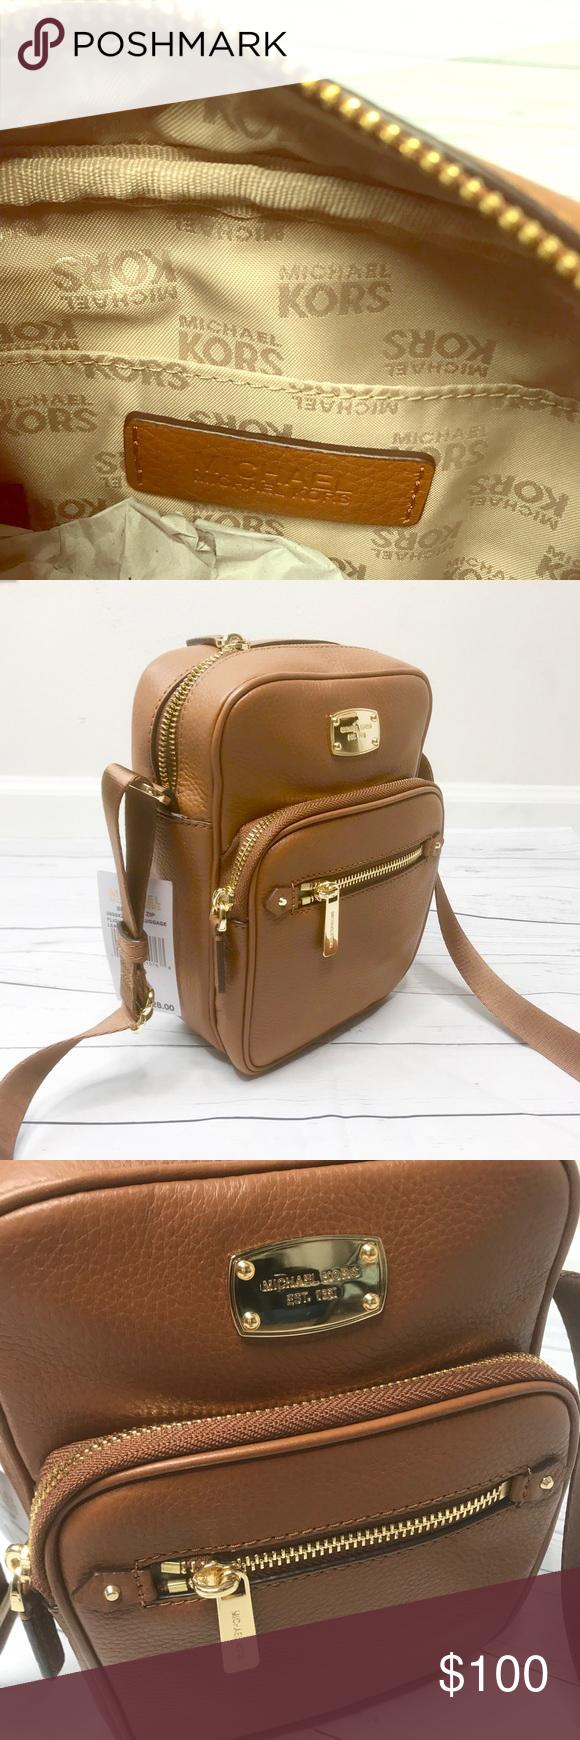 7550cc10b5 MICHAEL KORS CAMEL LEATHER FLIGHT MESSENGER BAG Brand new Bedford Camel  color messenger bag Michael Kors Bags Travel Bags